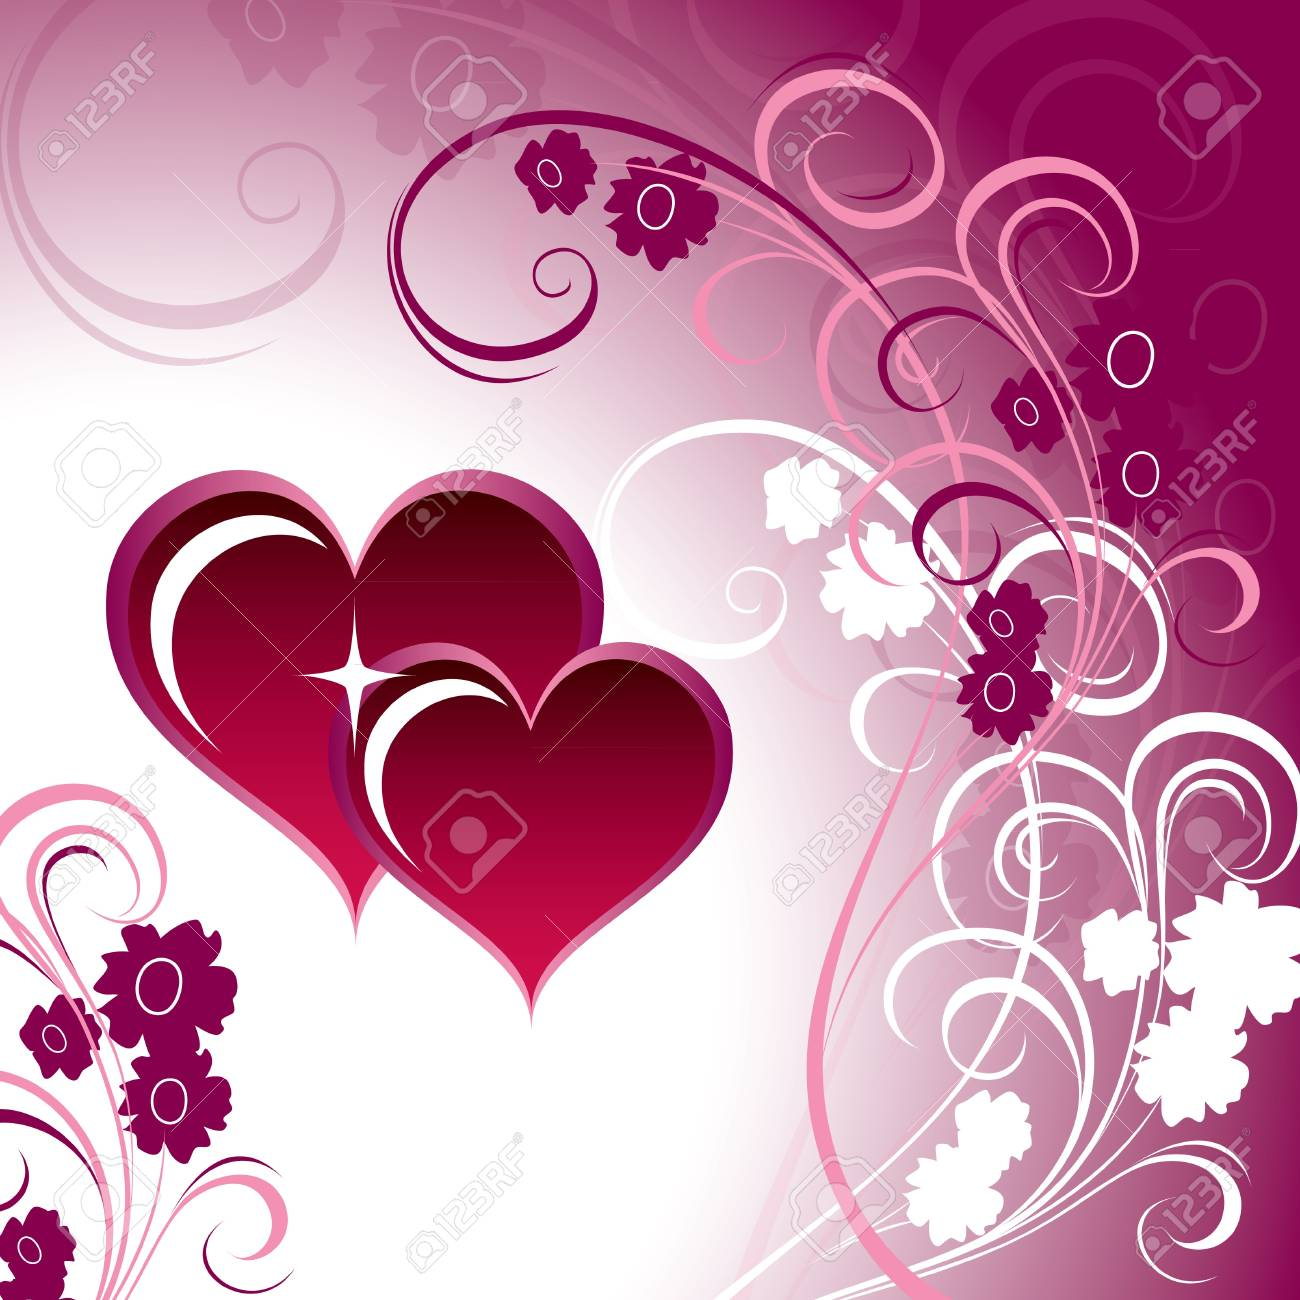 Valentines Day Background   Illustration Stock Vector - 17346175